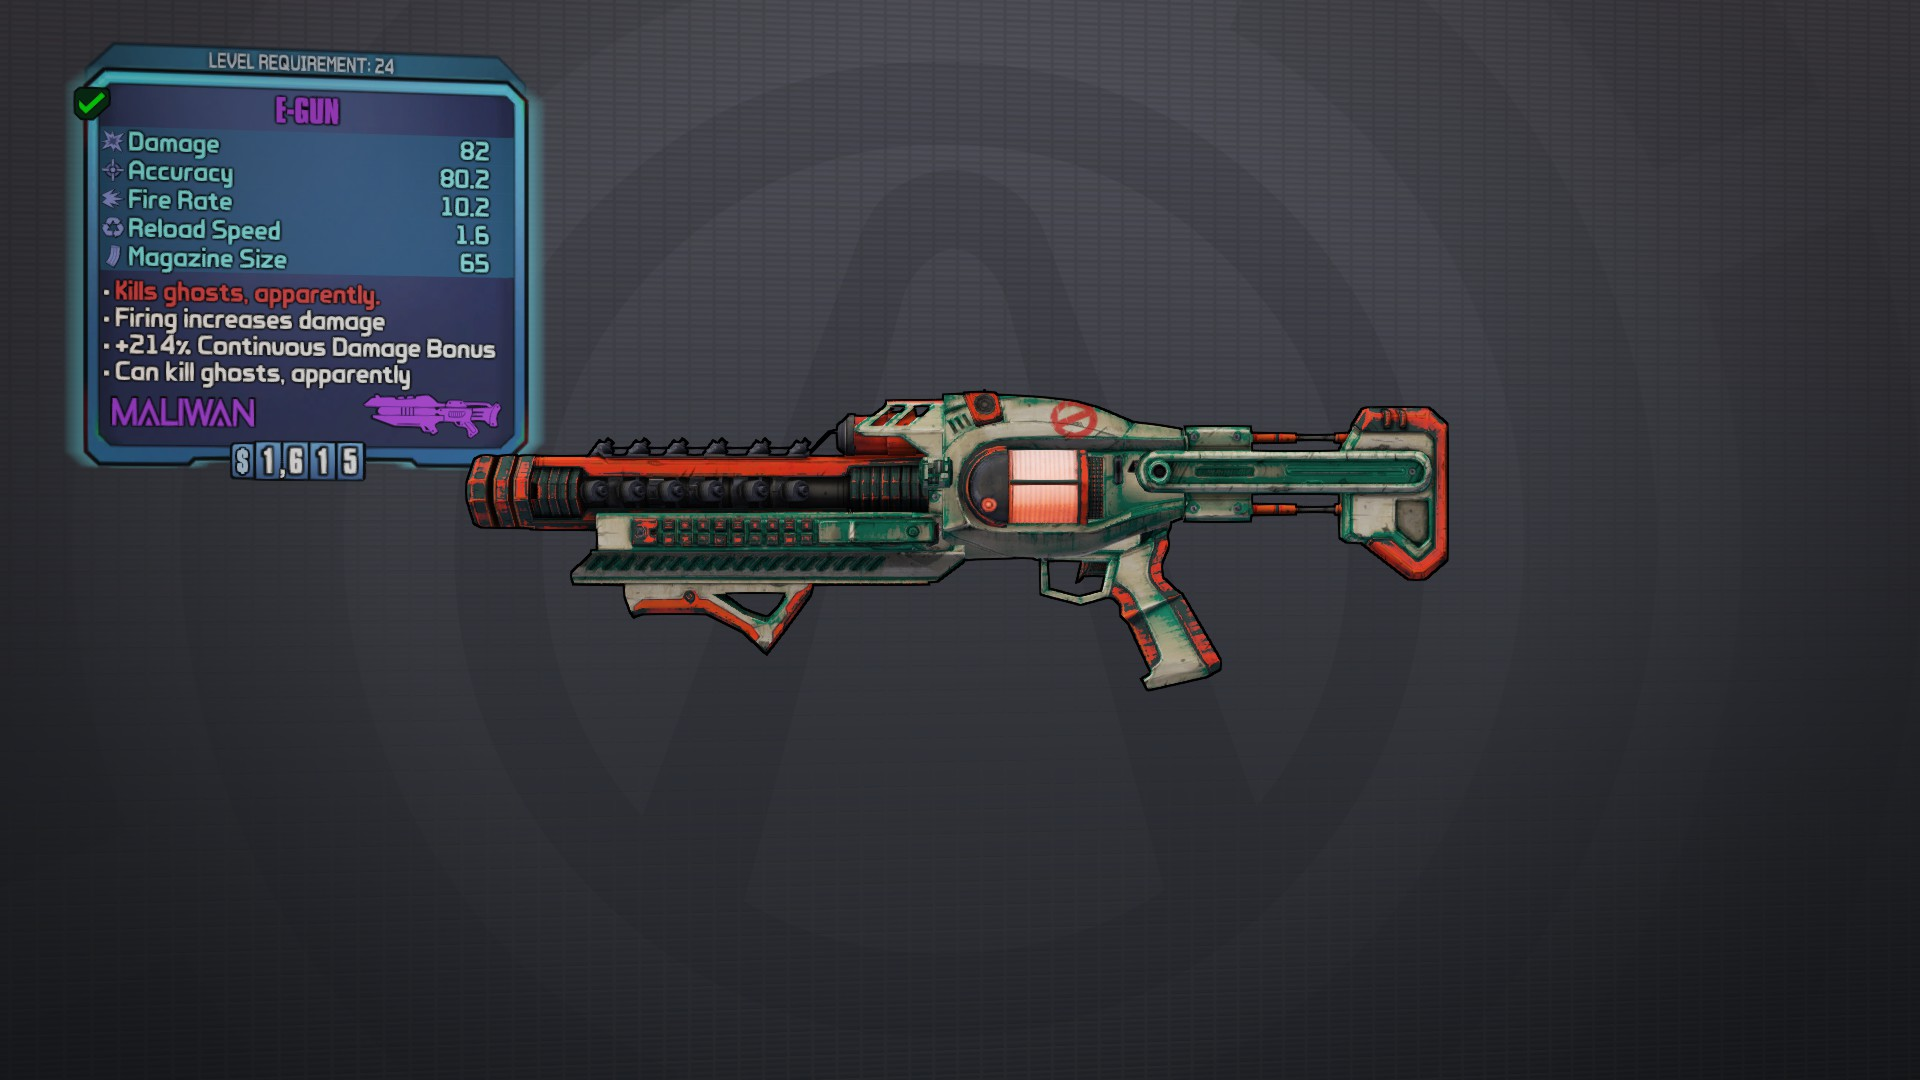 Borderlands Weapon Editor